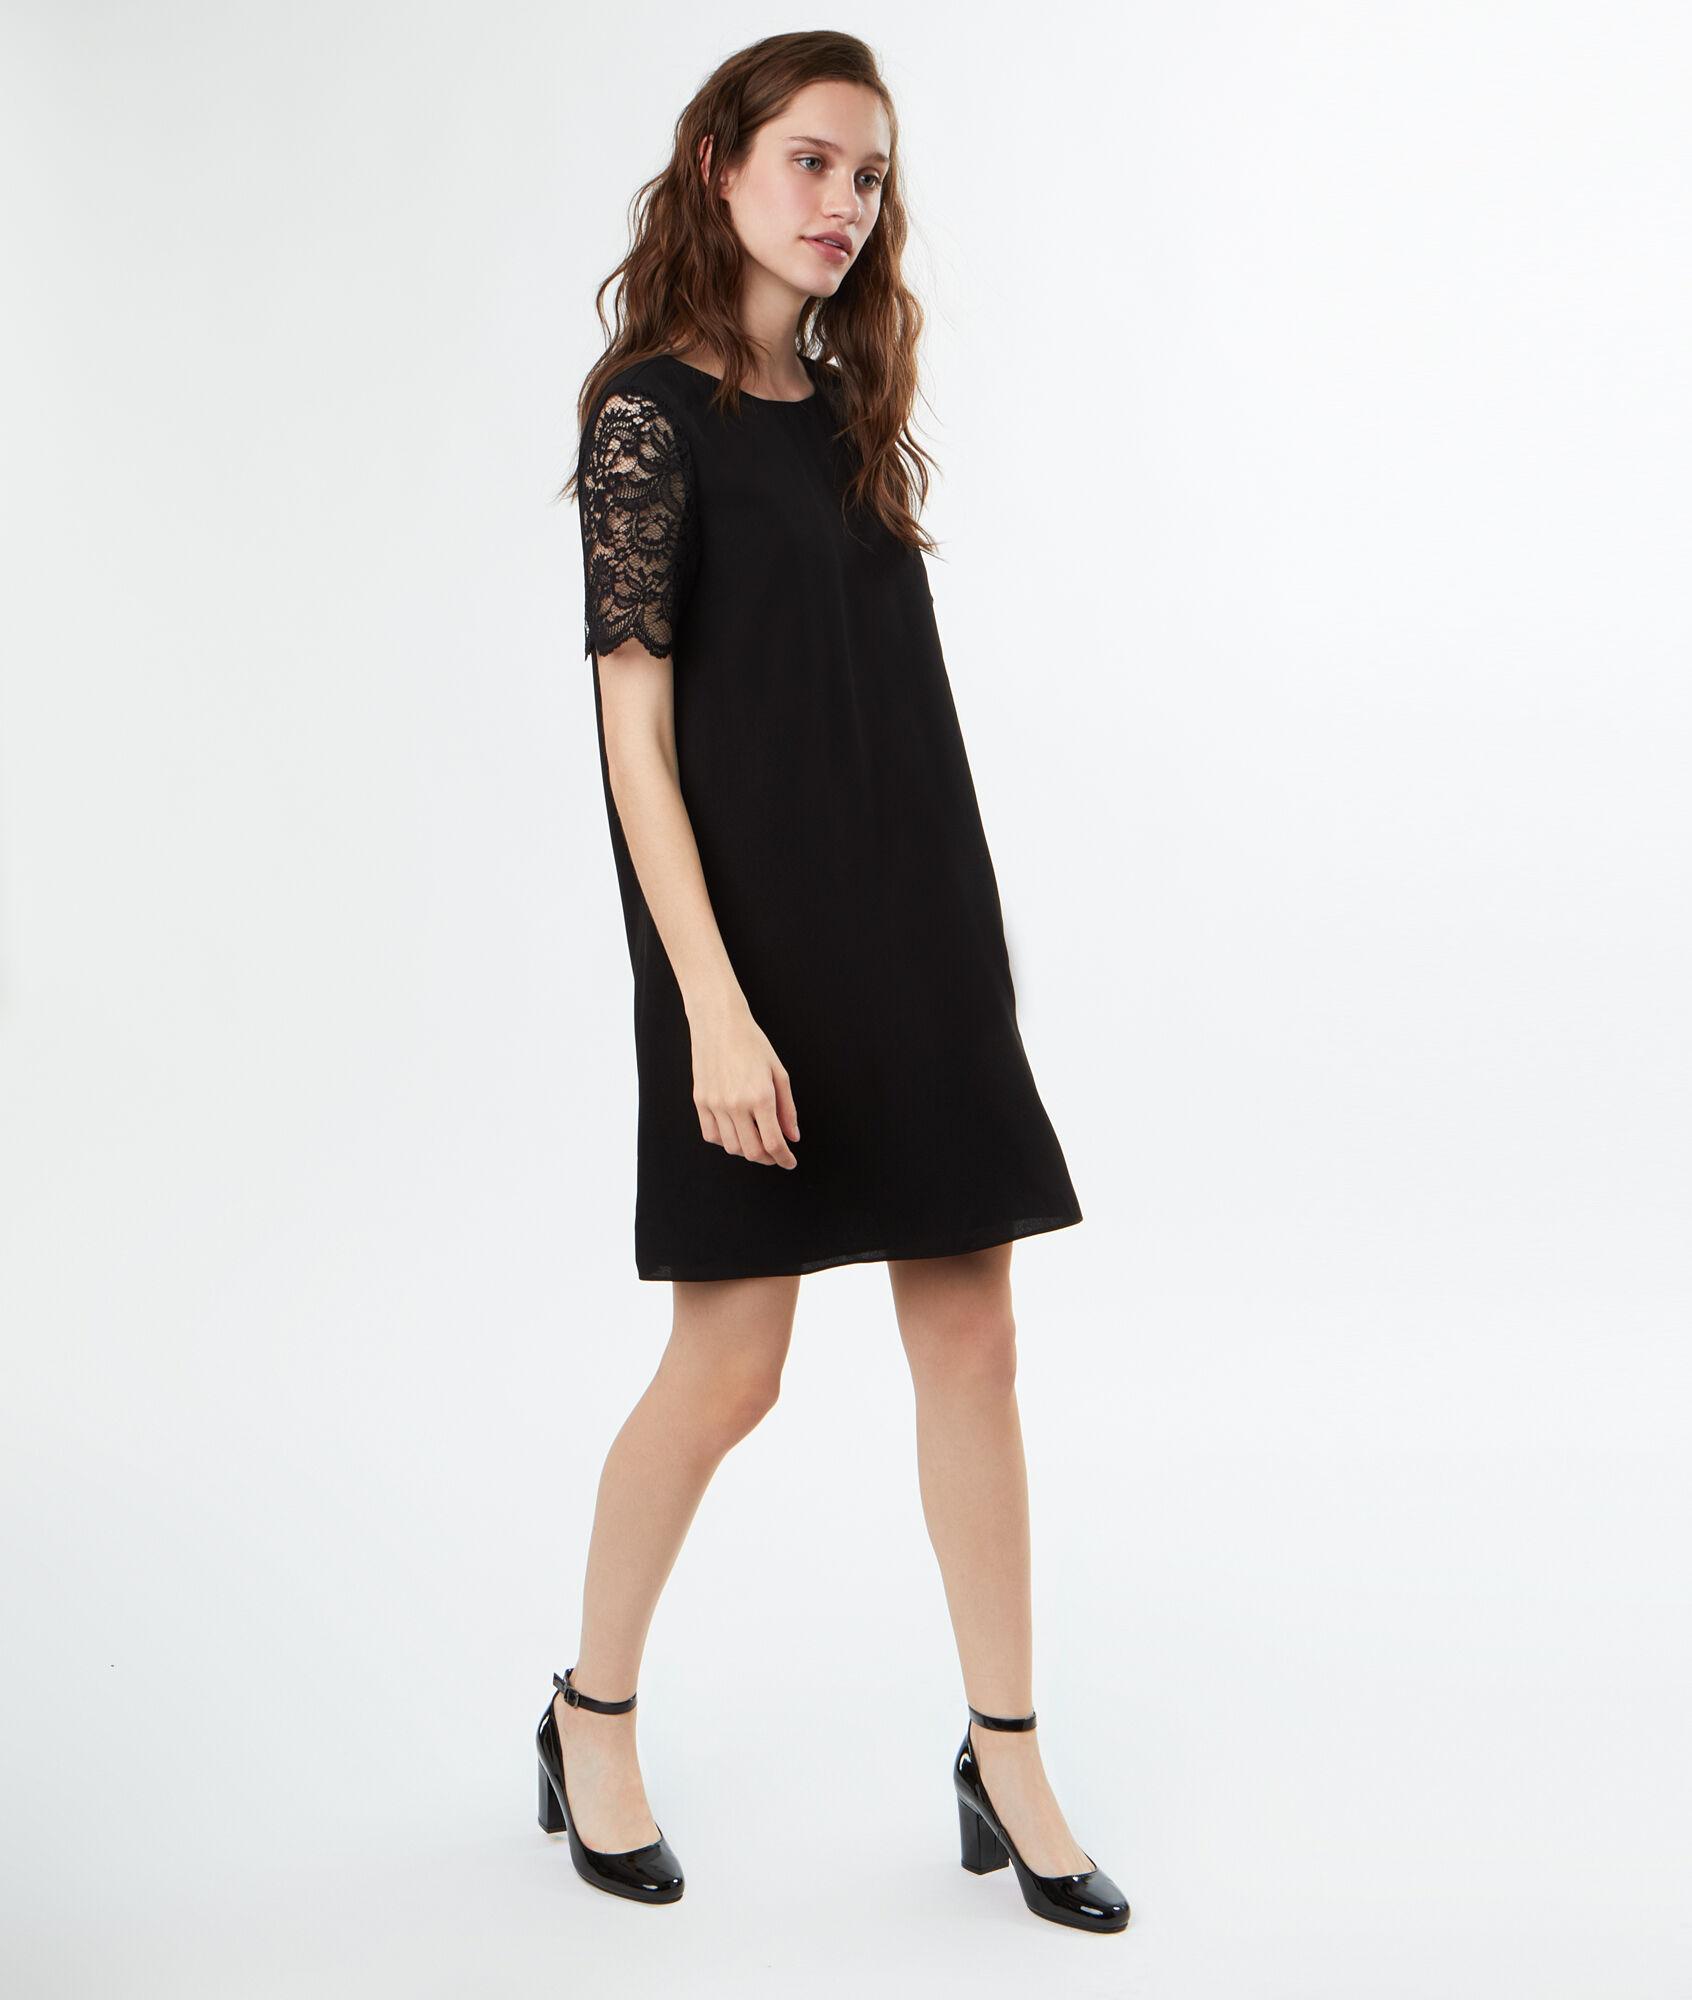 Robe Noir Etam En Manches Courtes Kate Dentelle w7U1w0